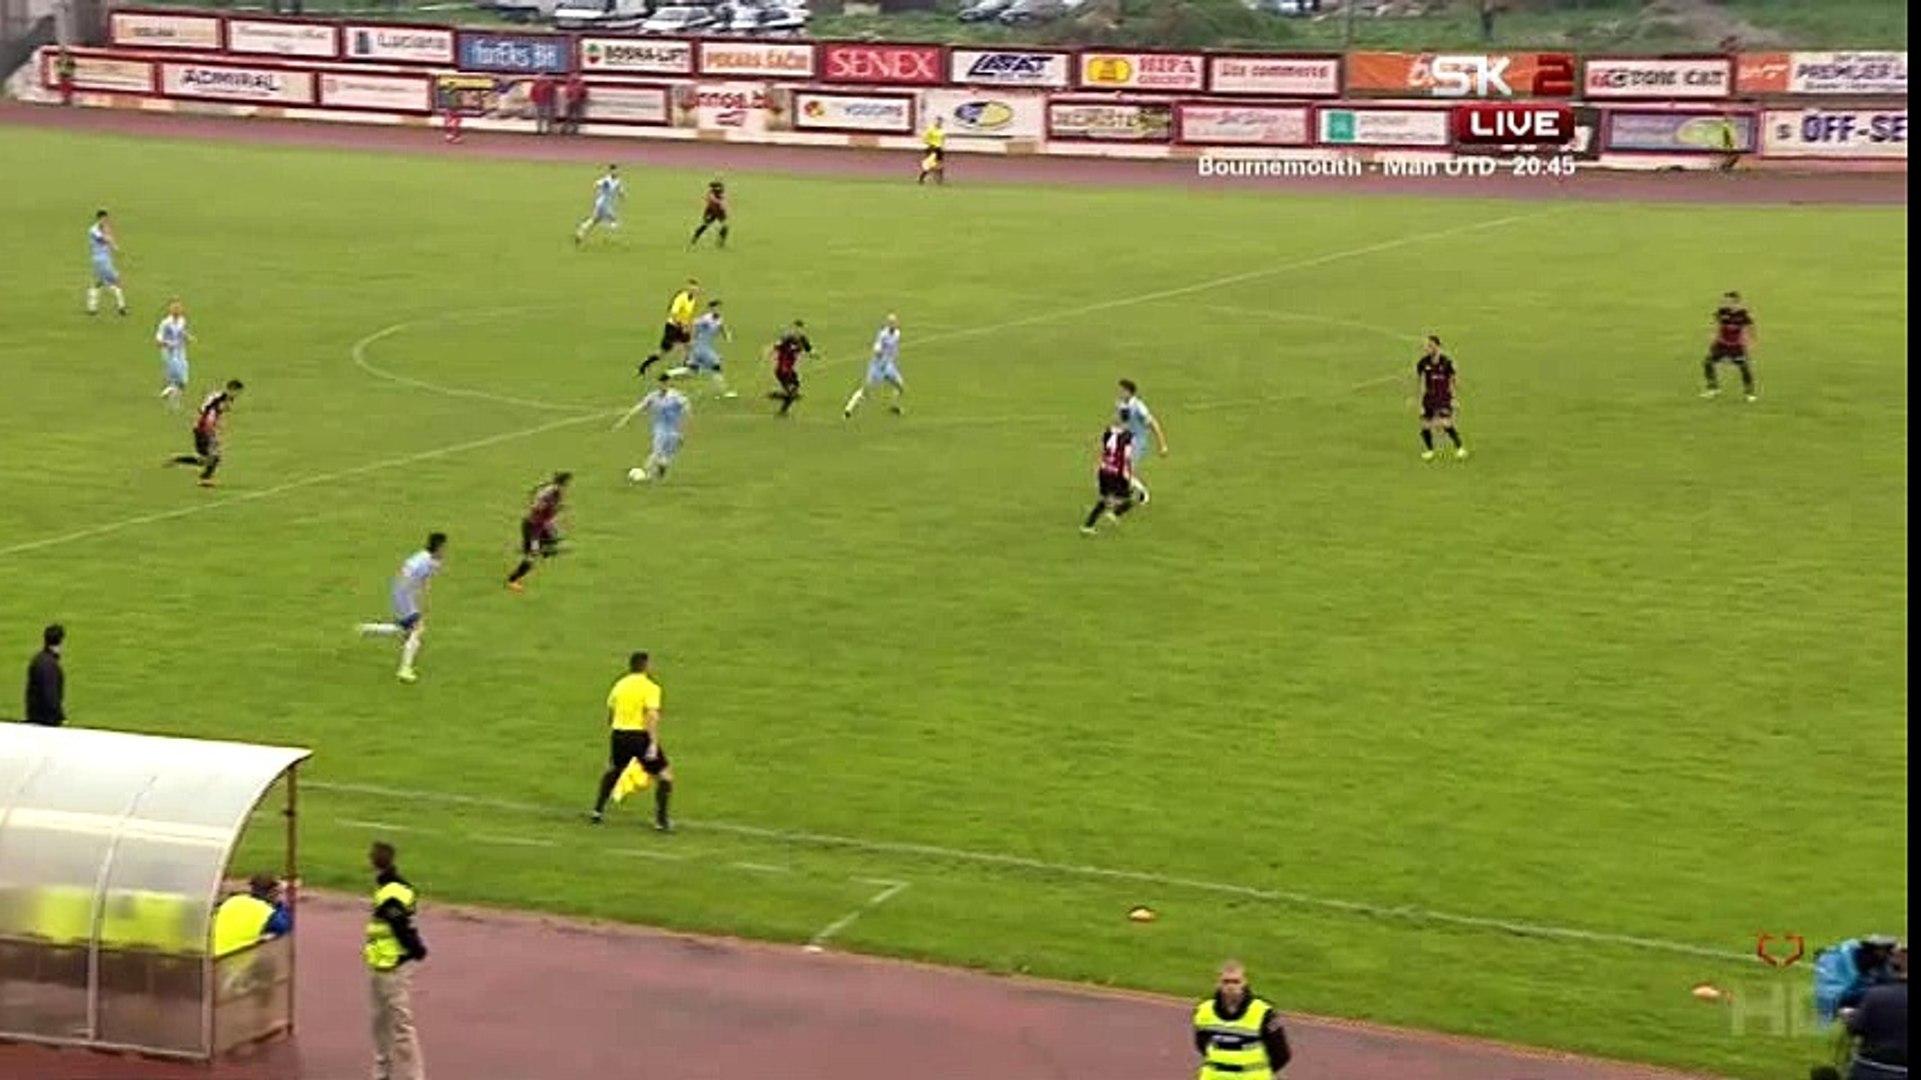 FK Sloboda - FK Željezničar [Kup] / Sporna situacija 1:2